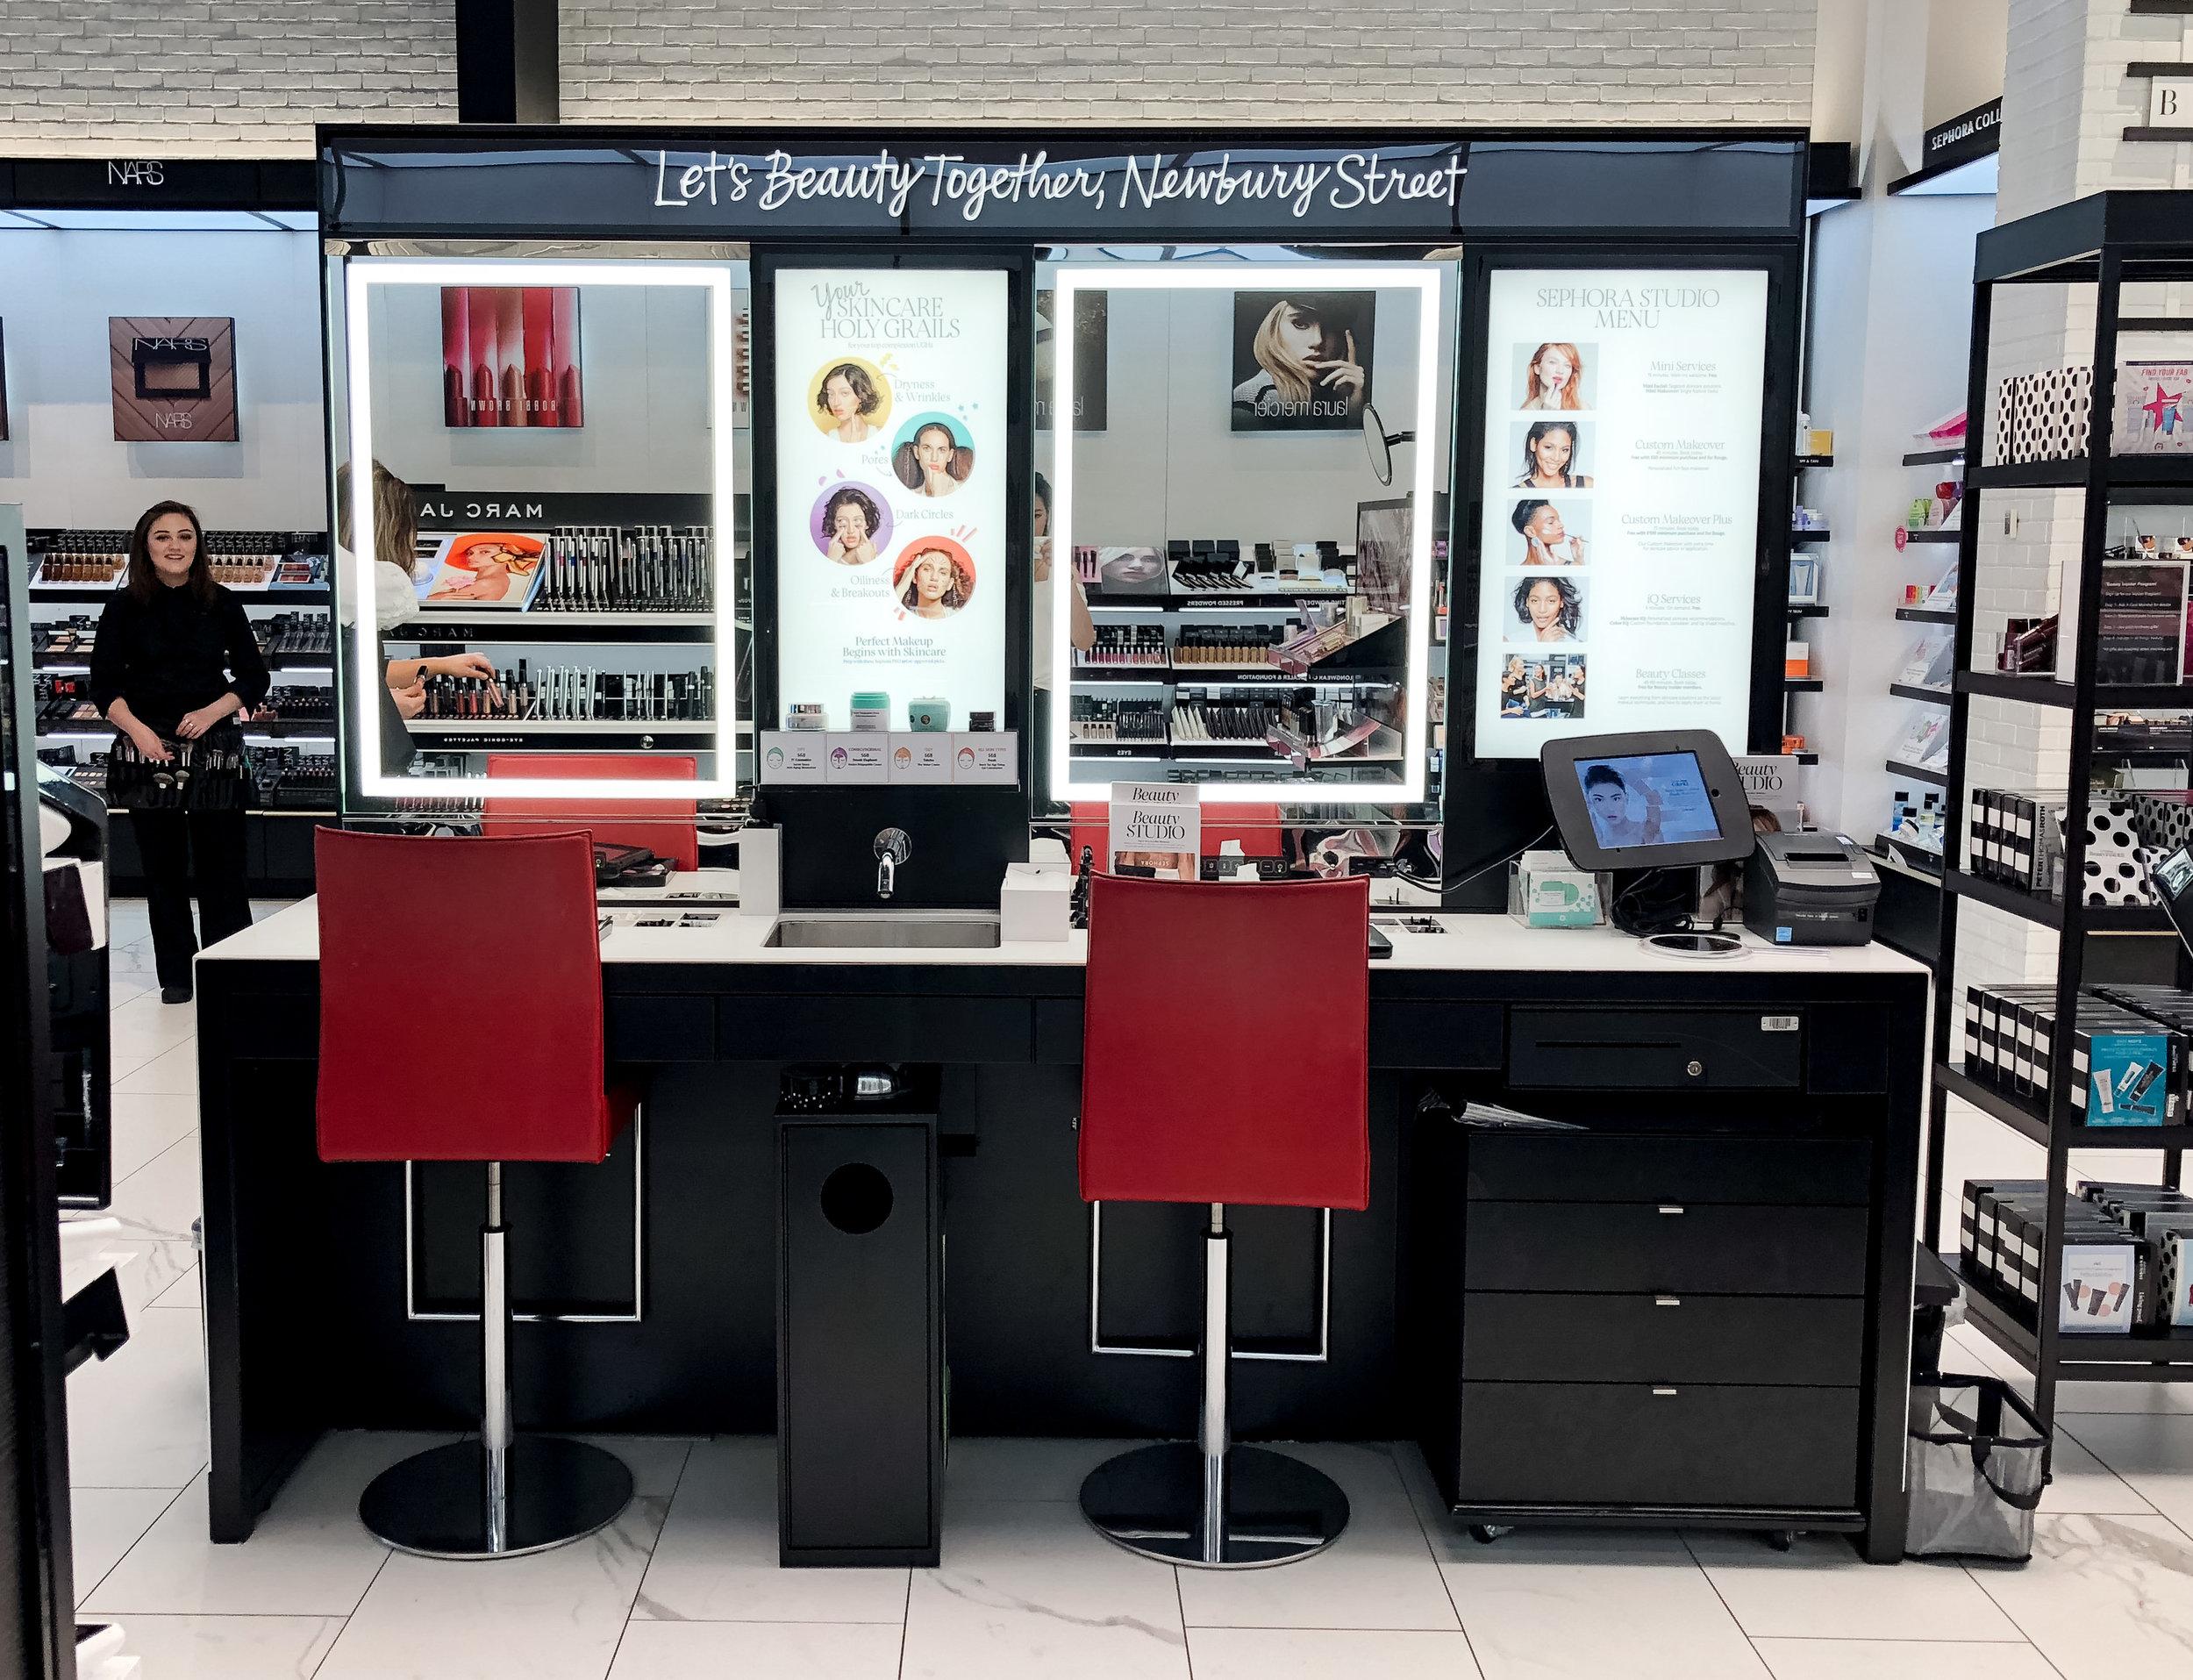 PERK Hydrating Facial at Sephora: TheNinesBlog.com - A Boston Blog